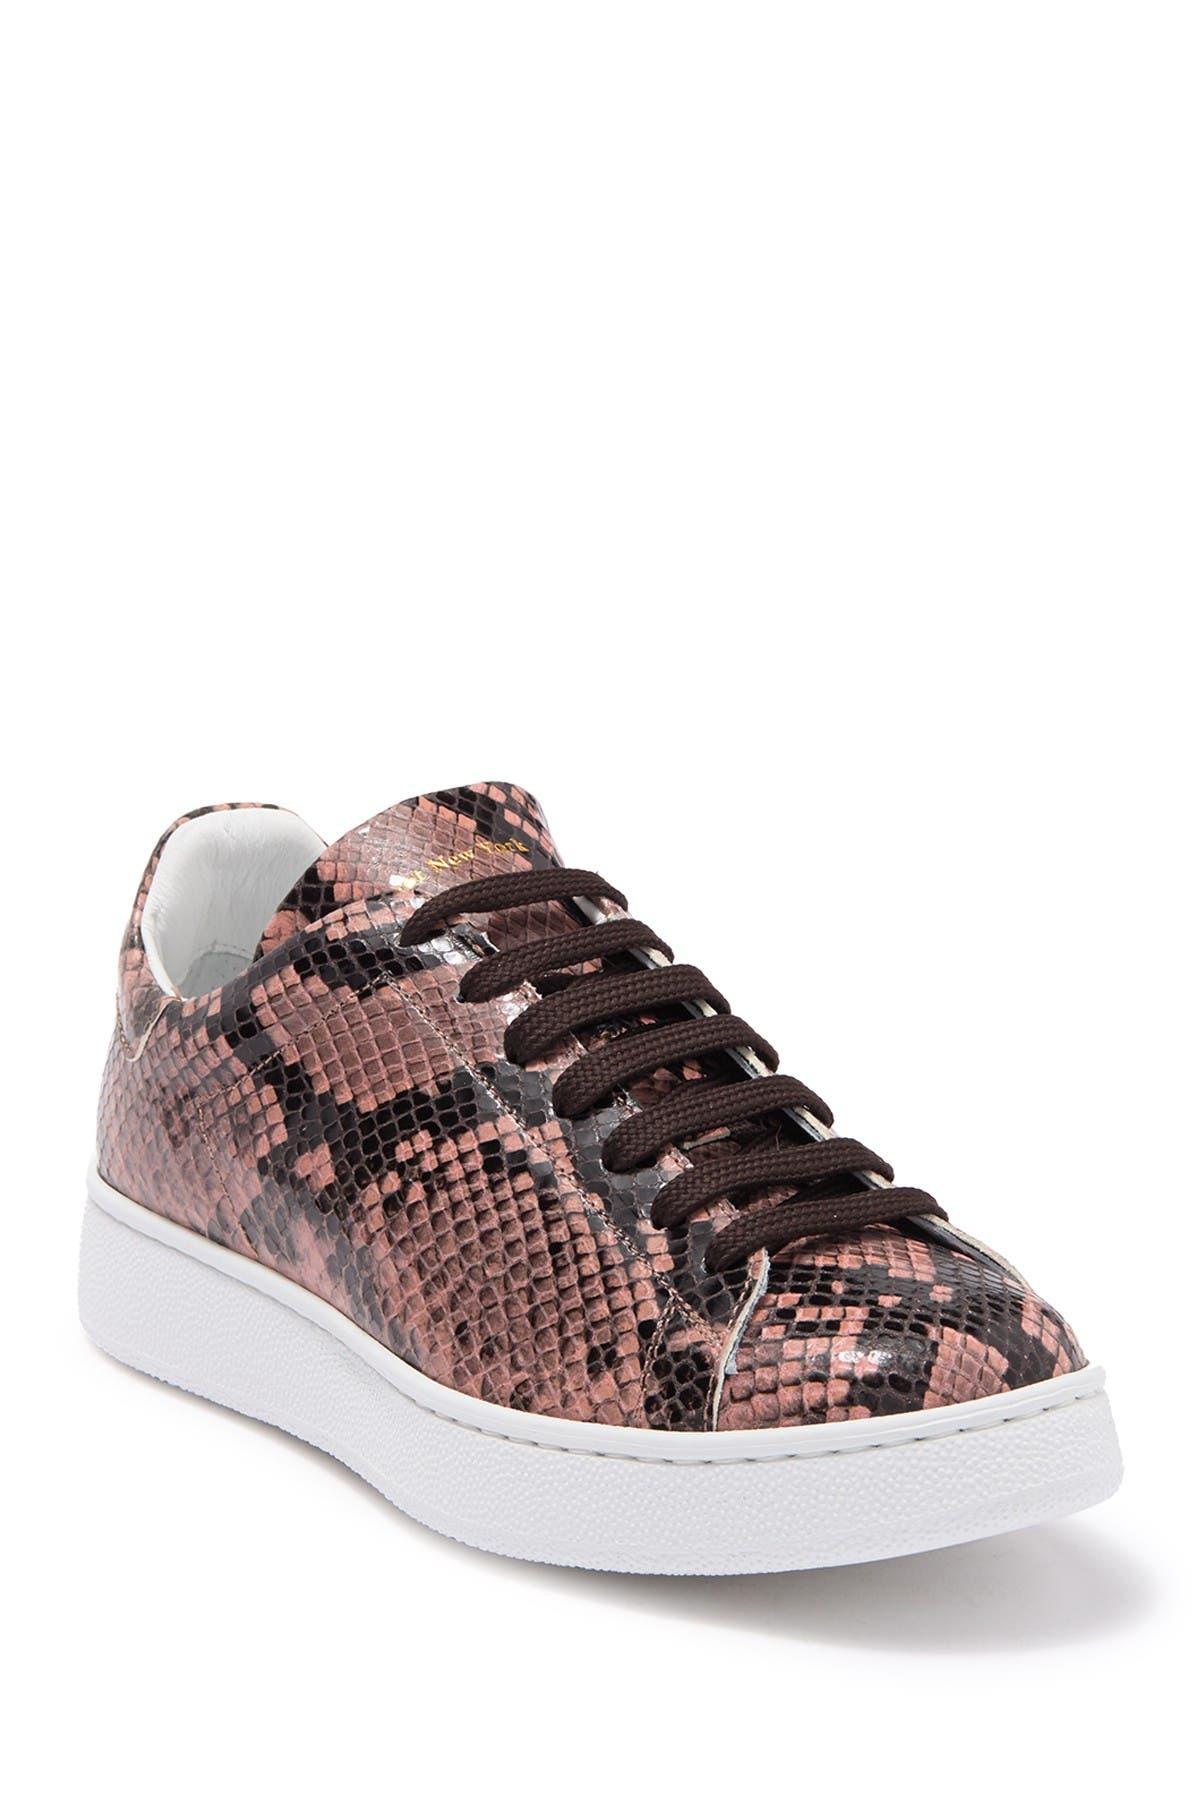 Image of To Boot New York Kelly Snake Embossed Platform Sneaker